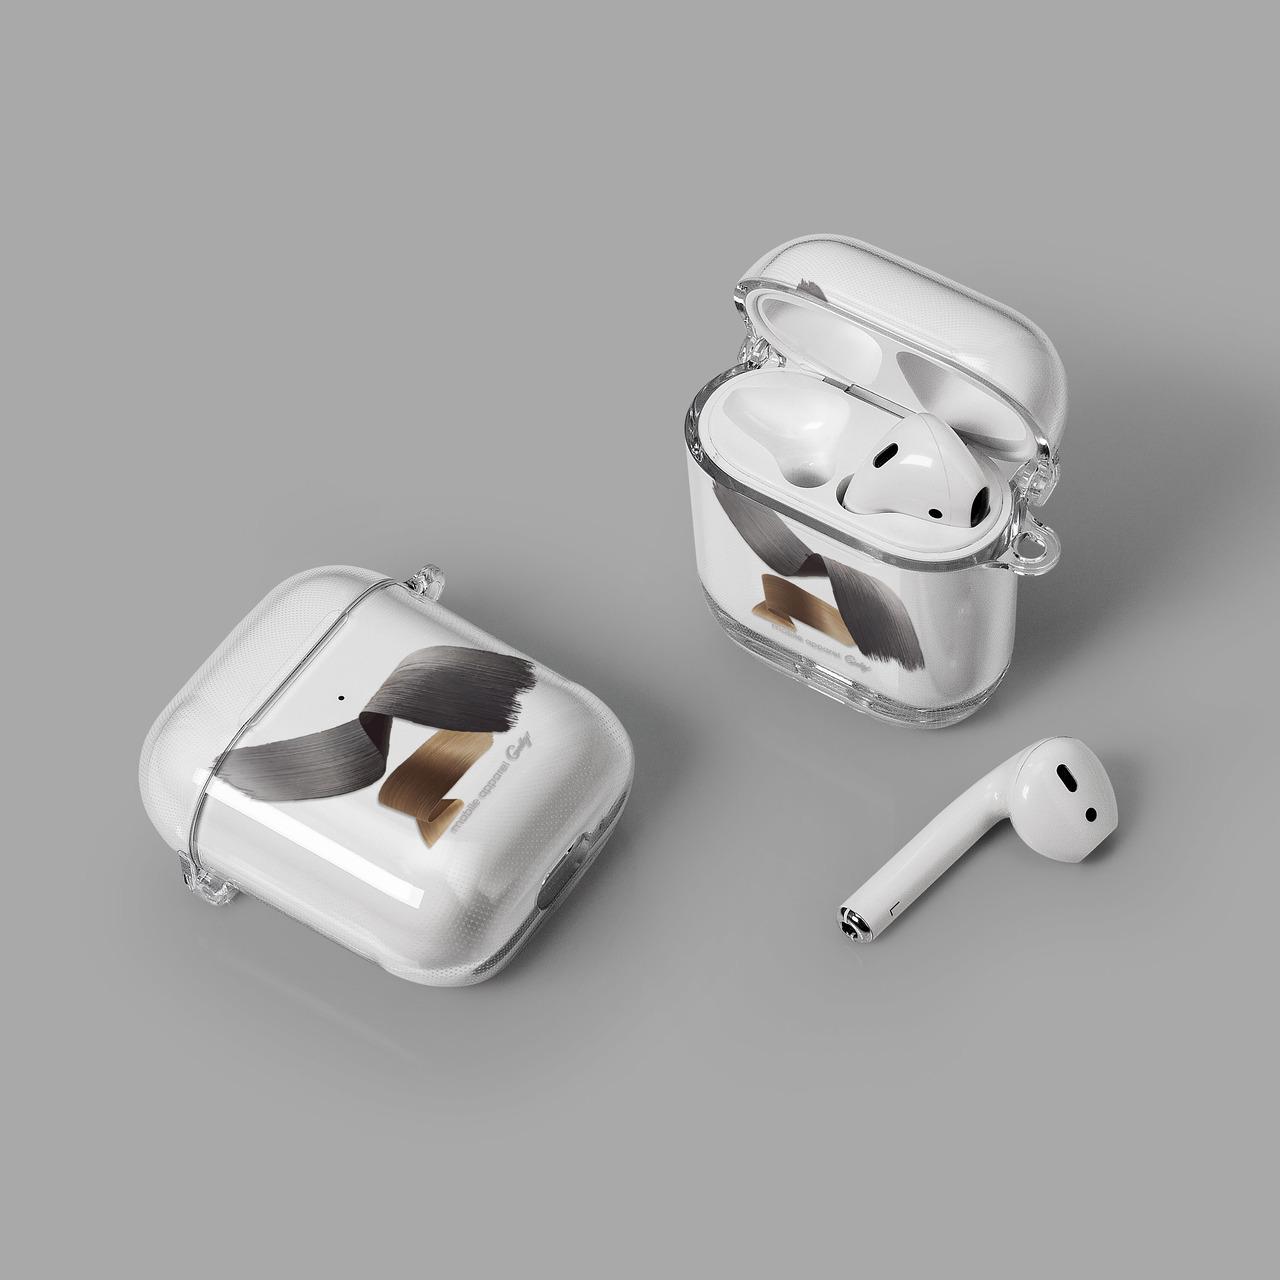 [Airpods cases] Simplicity No.03